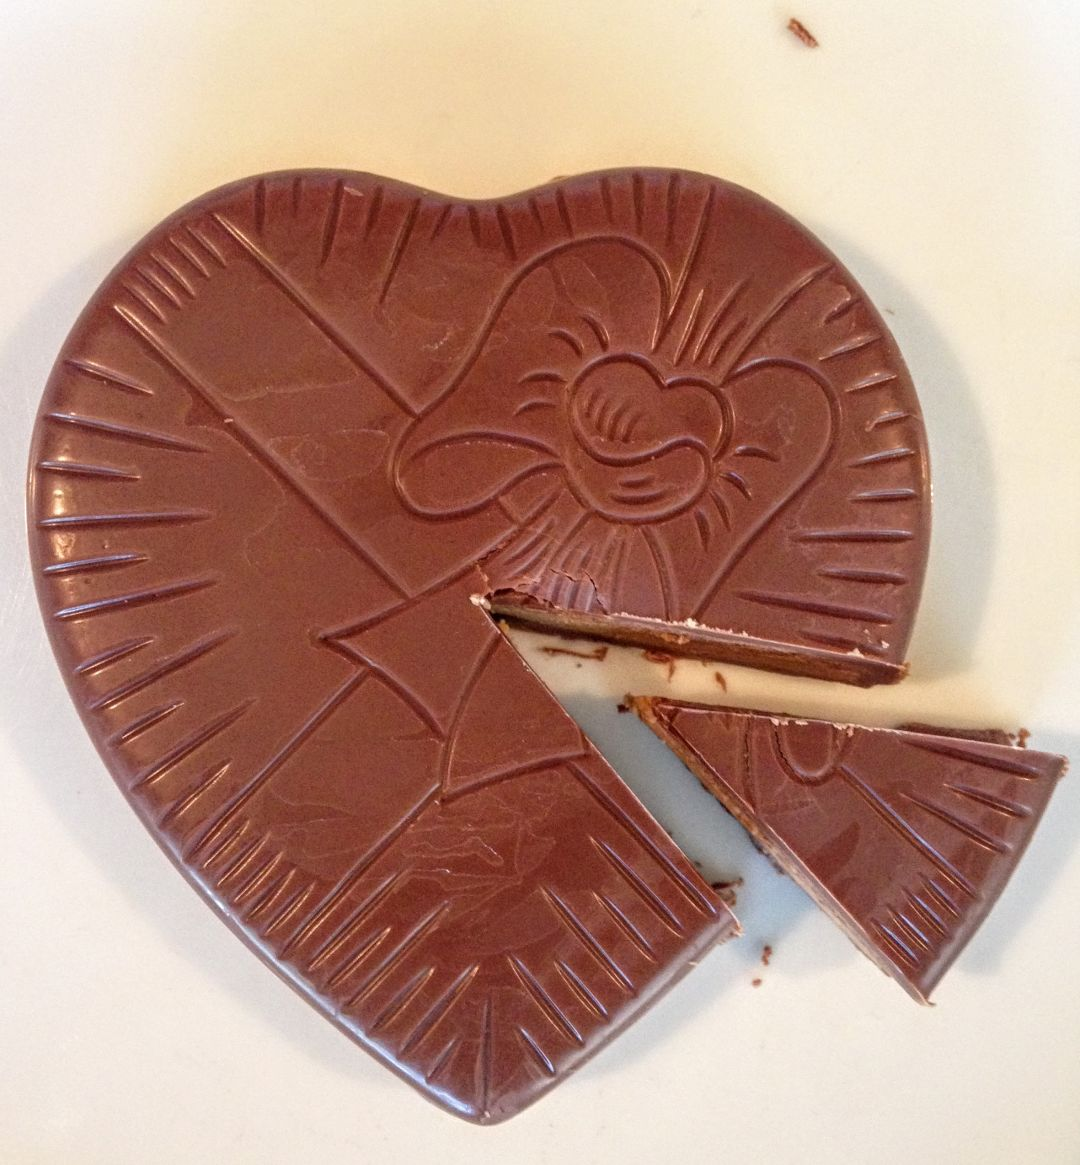 Reese s peanut butter heart knopsb